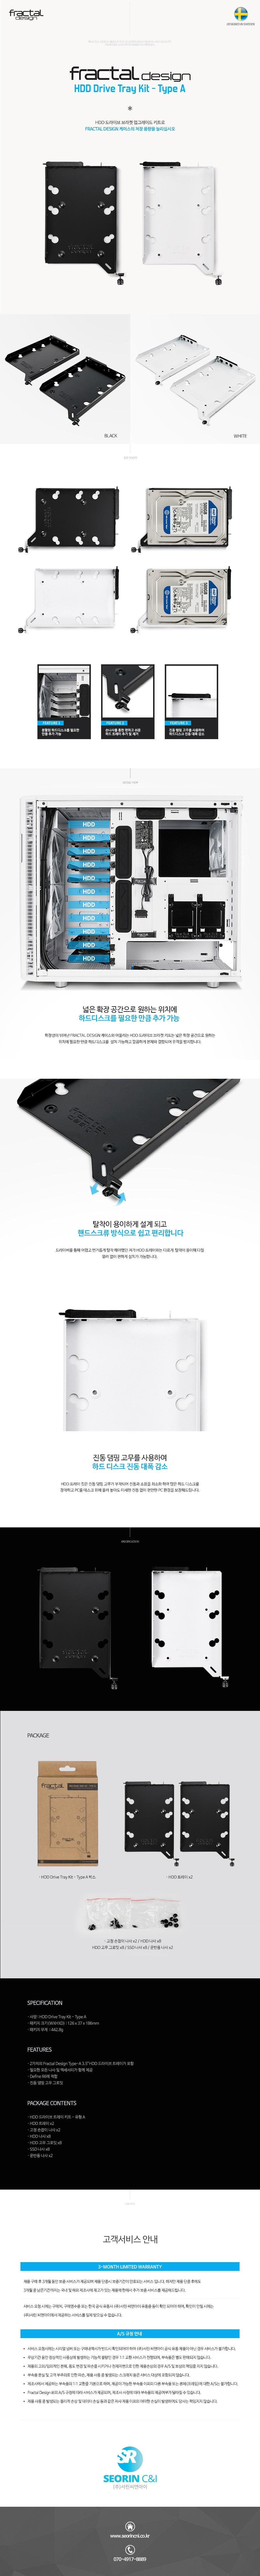 Fractal Design HDD Drive Tray Kit